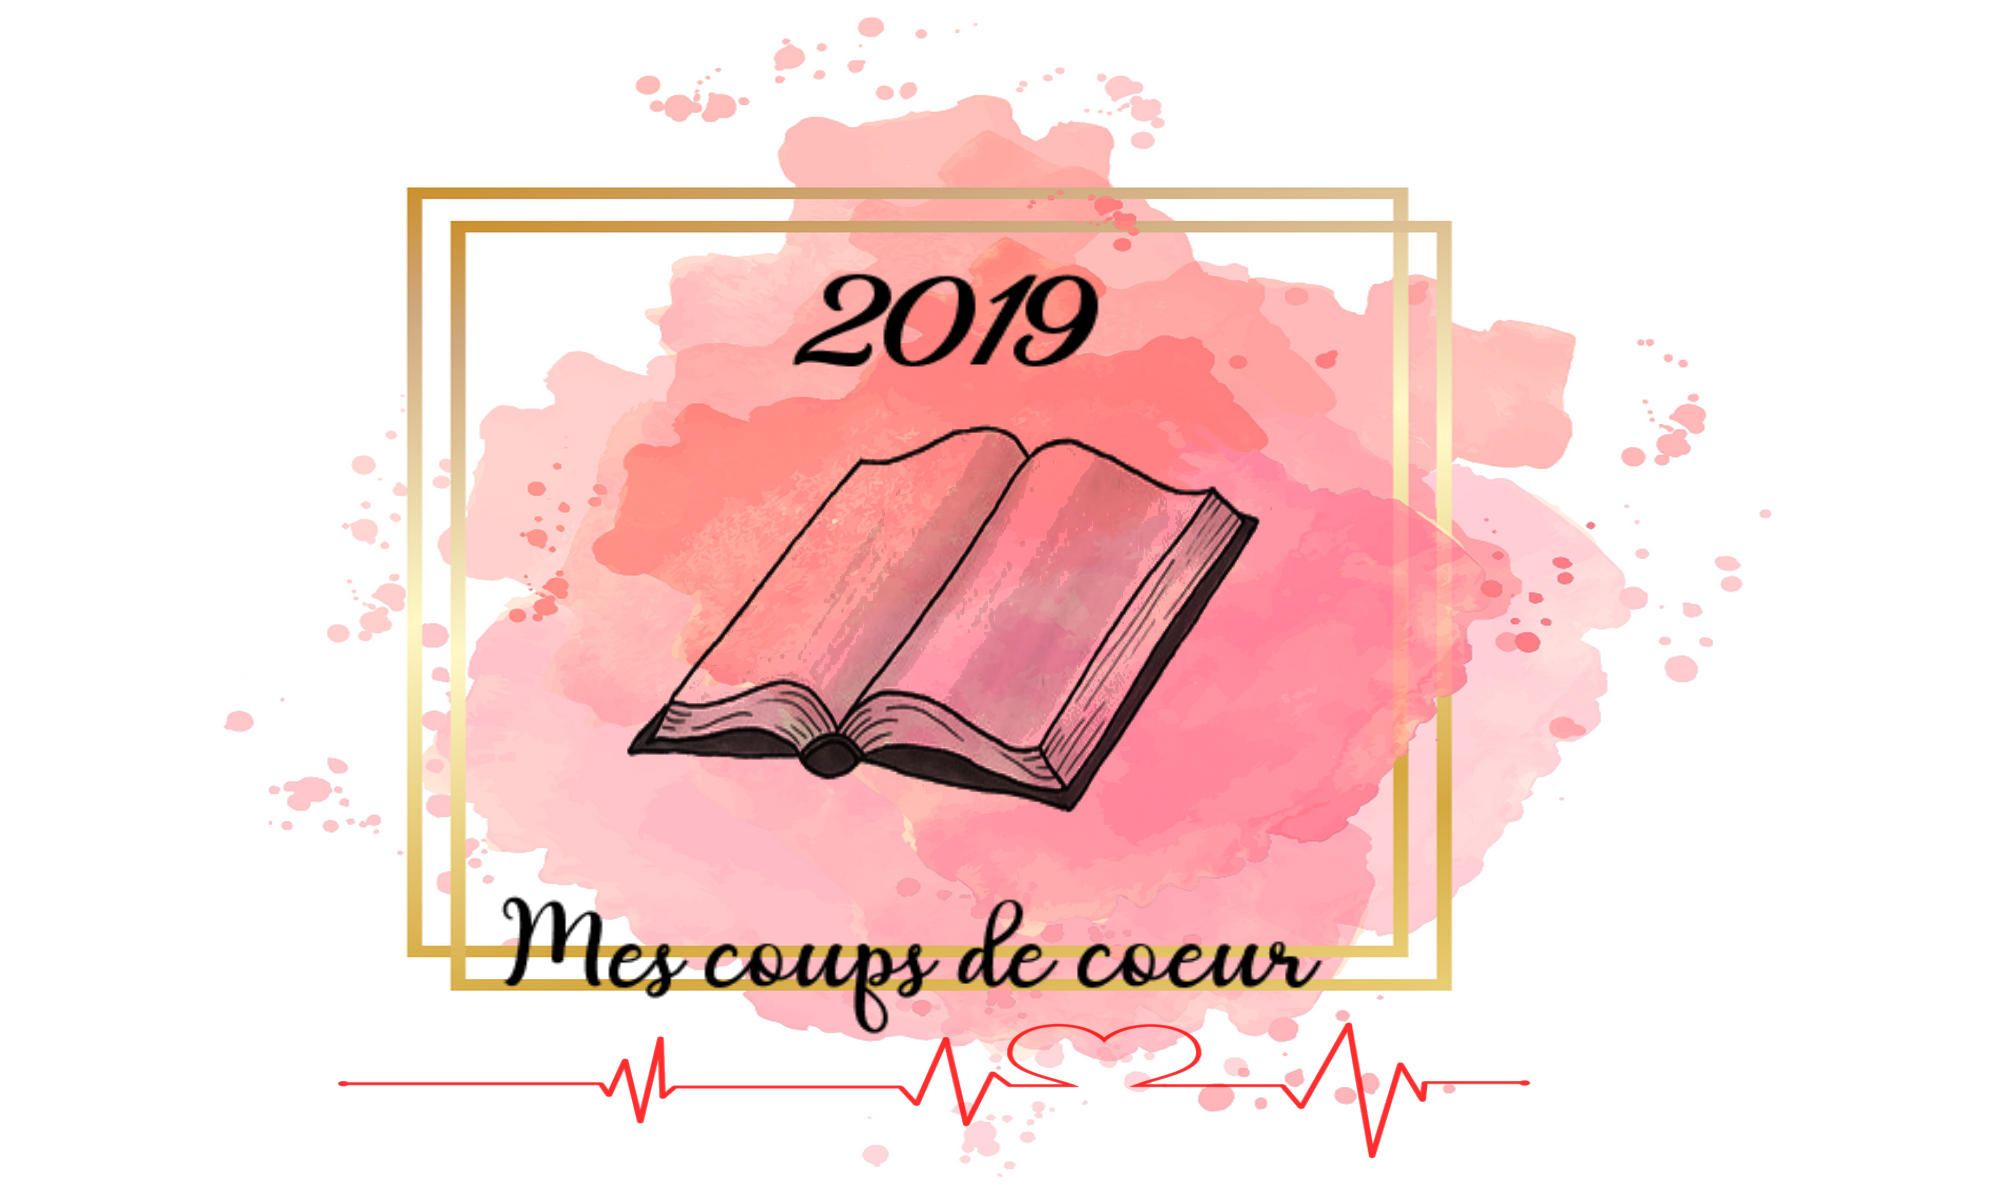 mes coups de coeur 2019.png